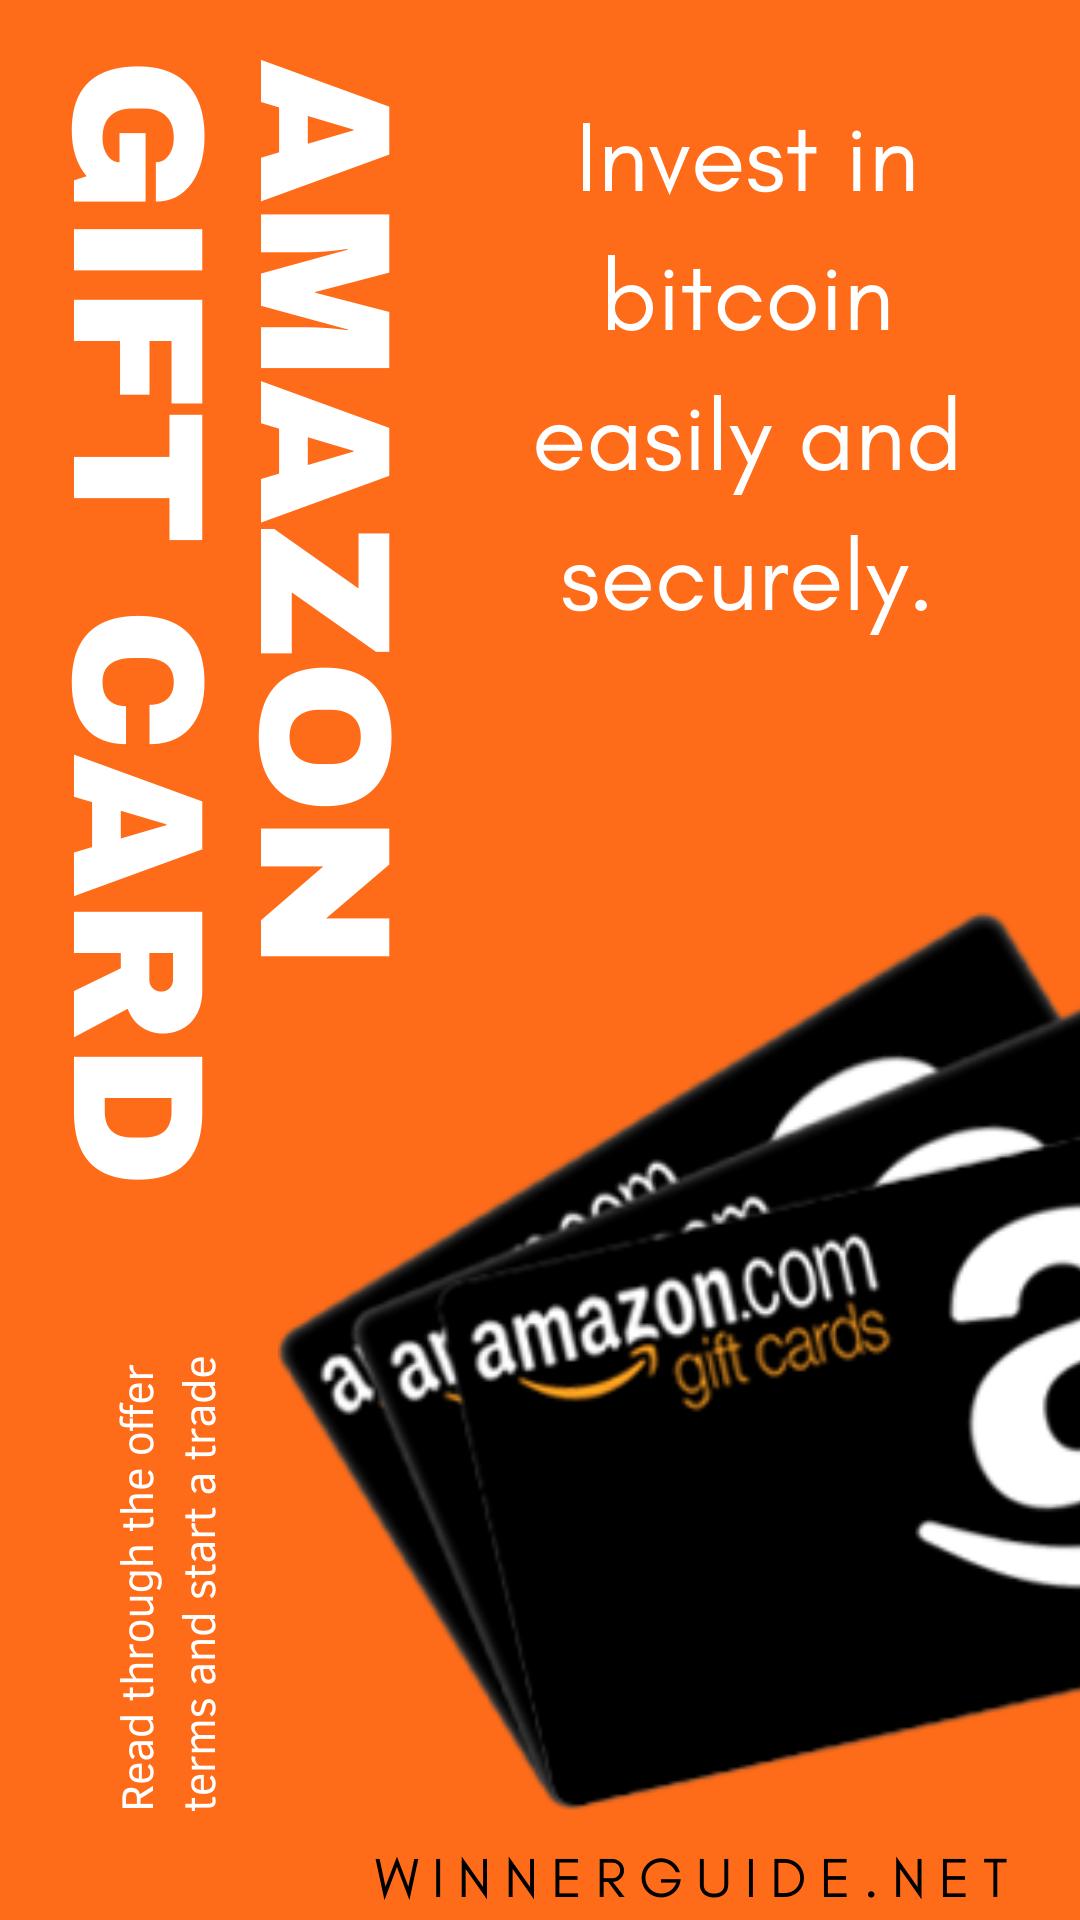 Buy Bitcoins Winnerguide Amazon Gift Cards Sephora Gift Card Amazon Gifts